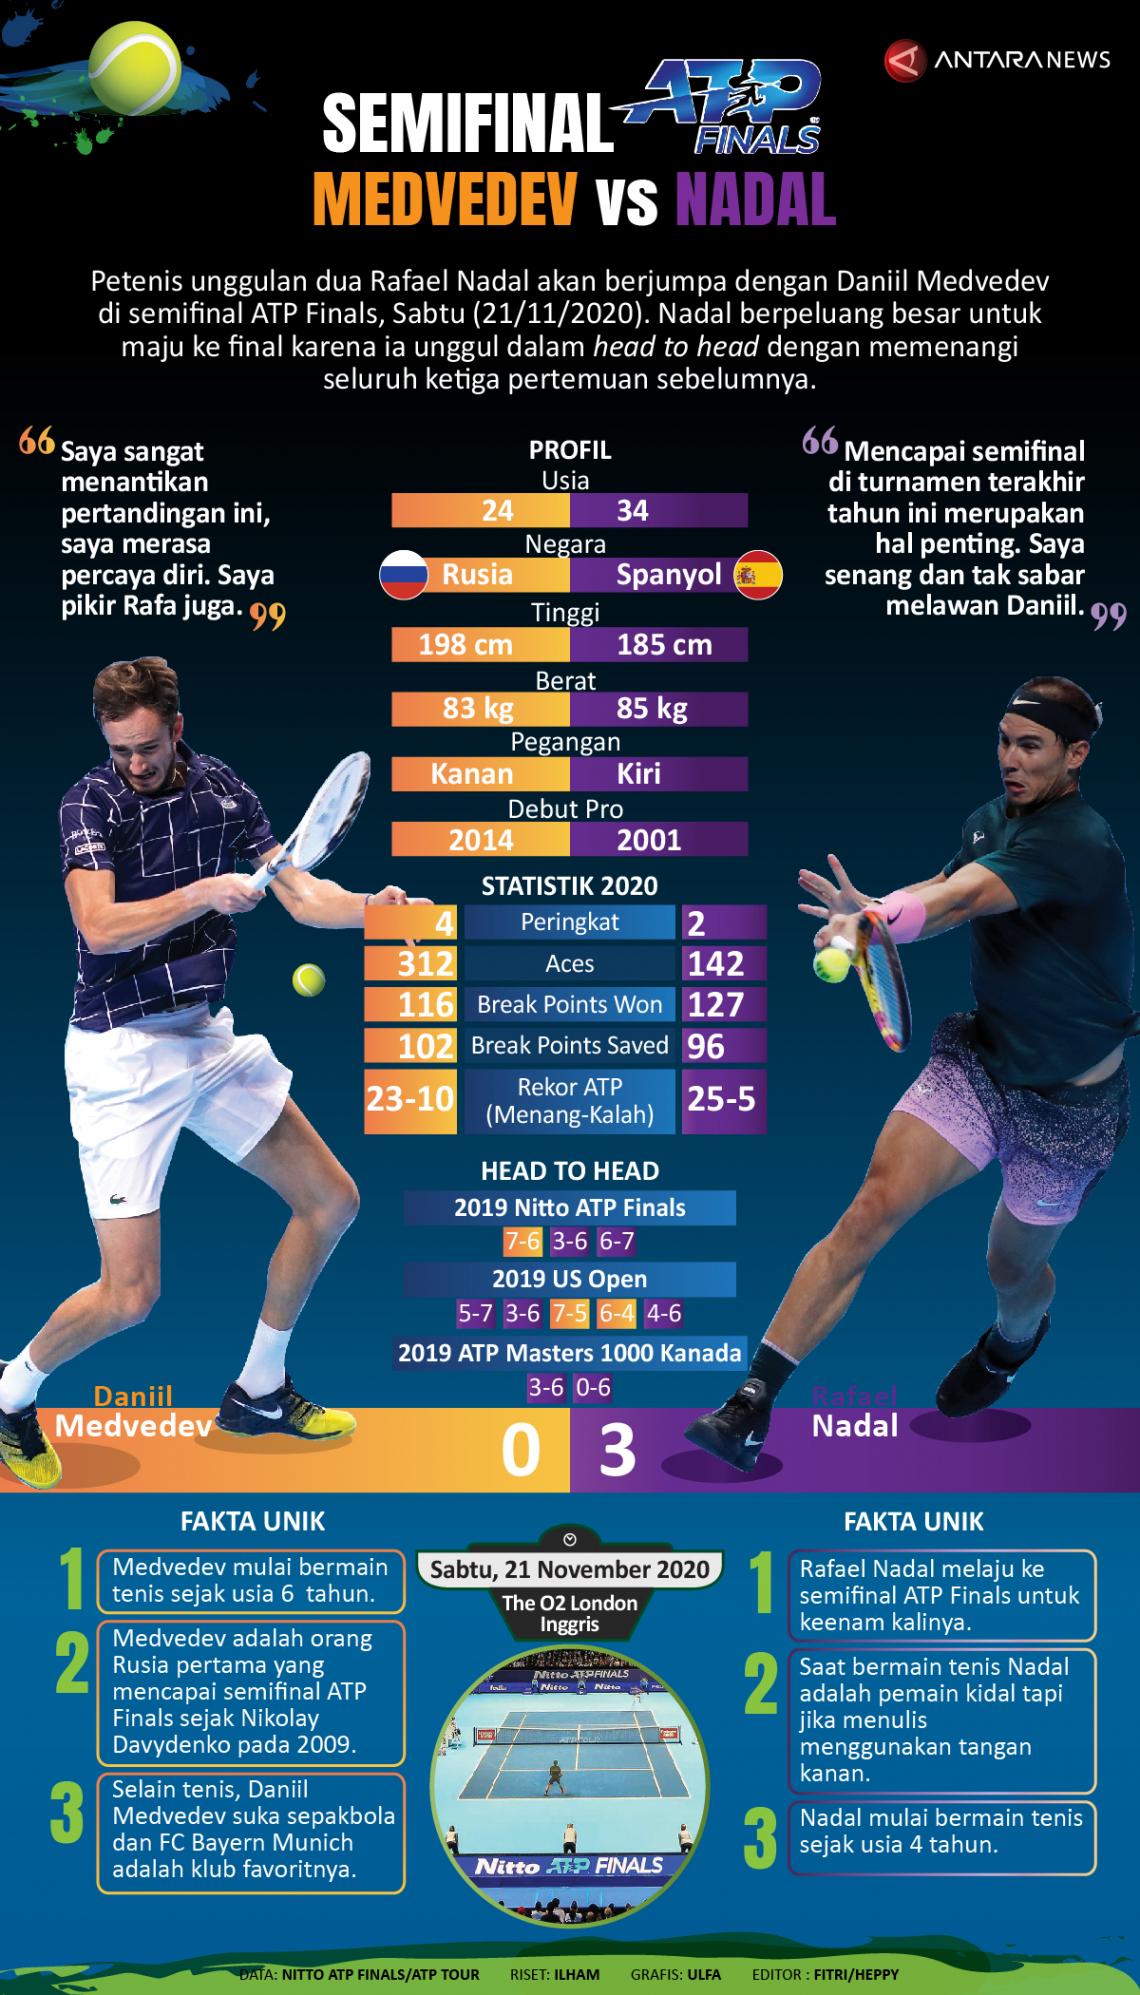 Jelang semifinal ATP Finals, Medvedev vs Nadal